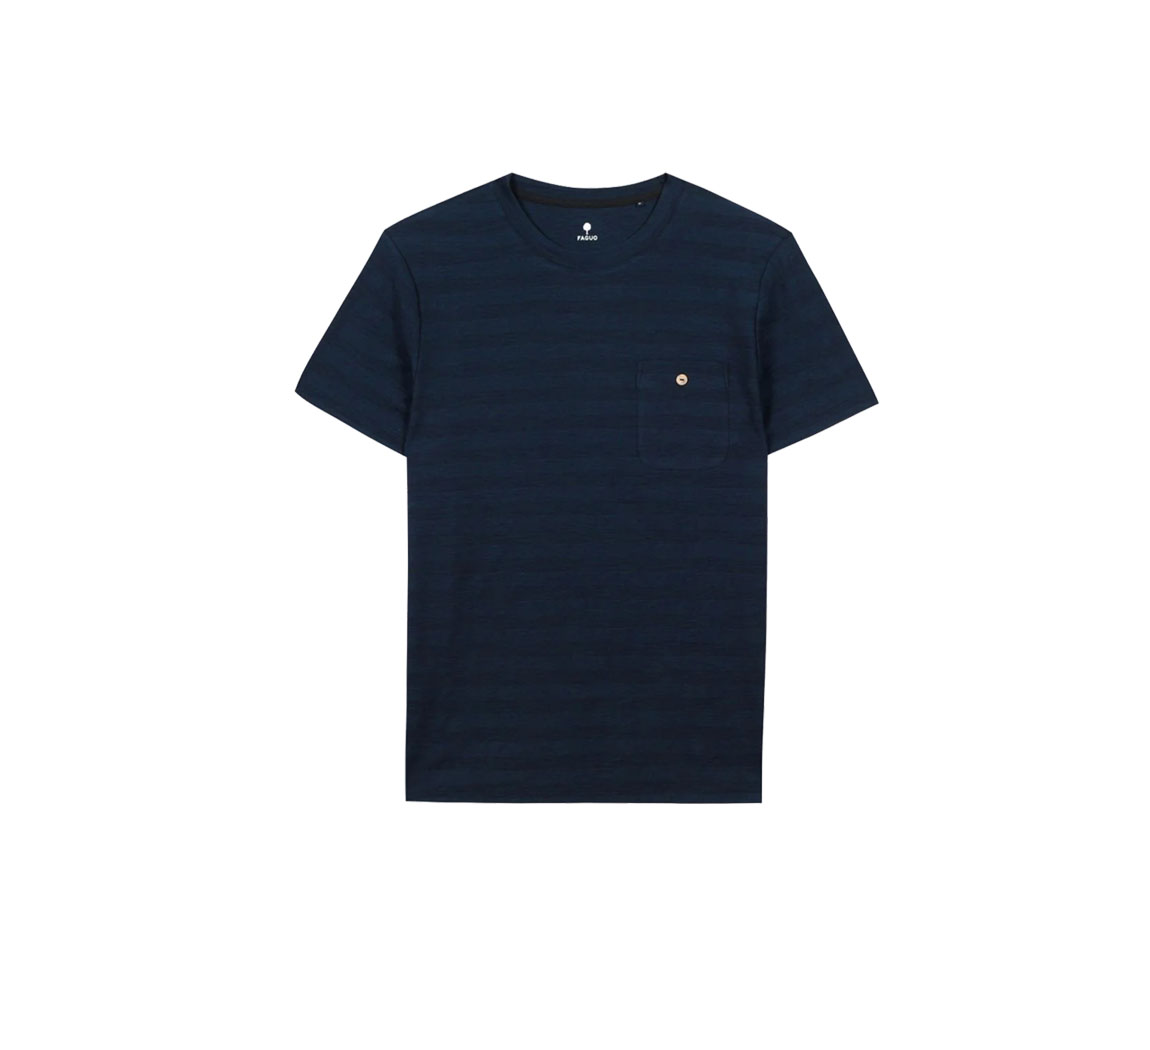 Vêtement homme Olonne Contrasted pocket